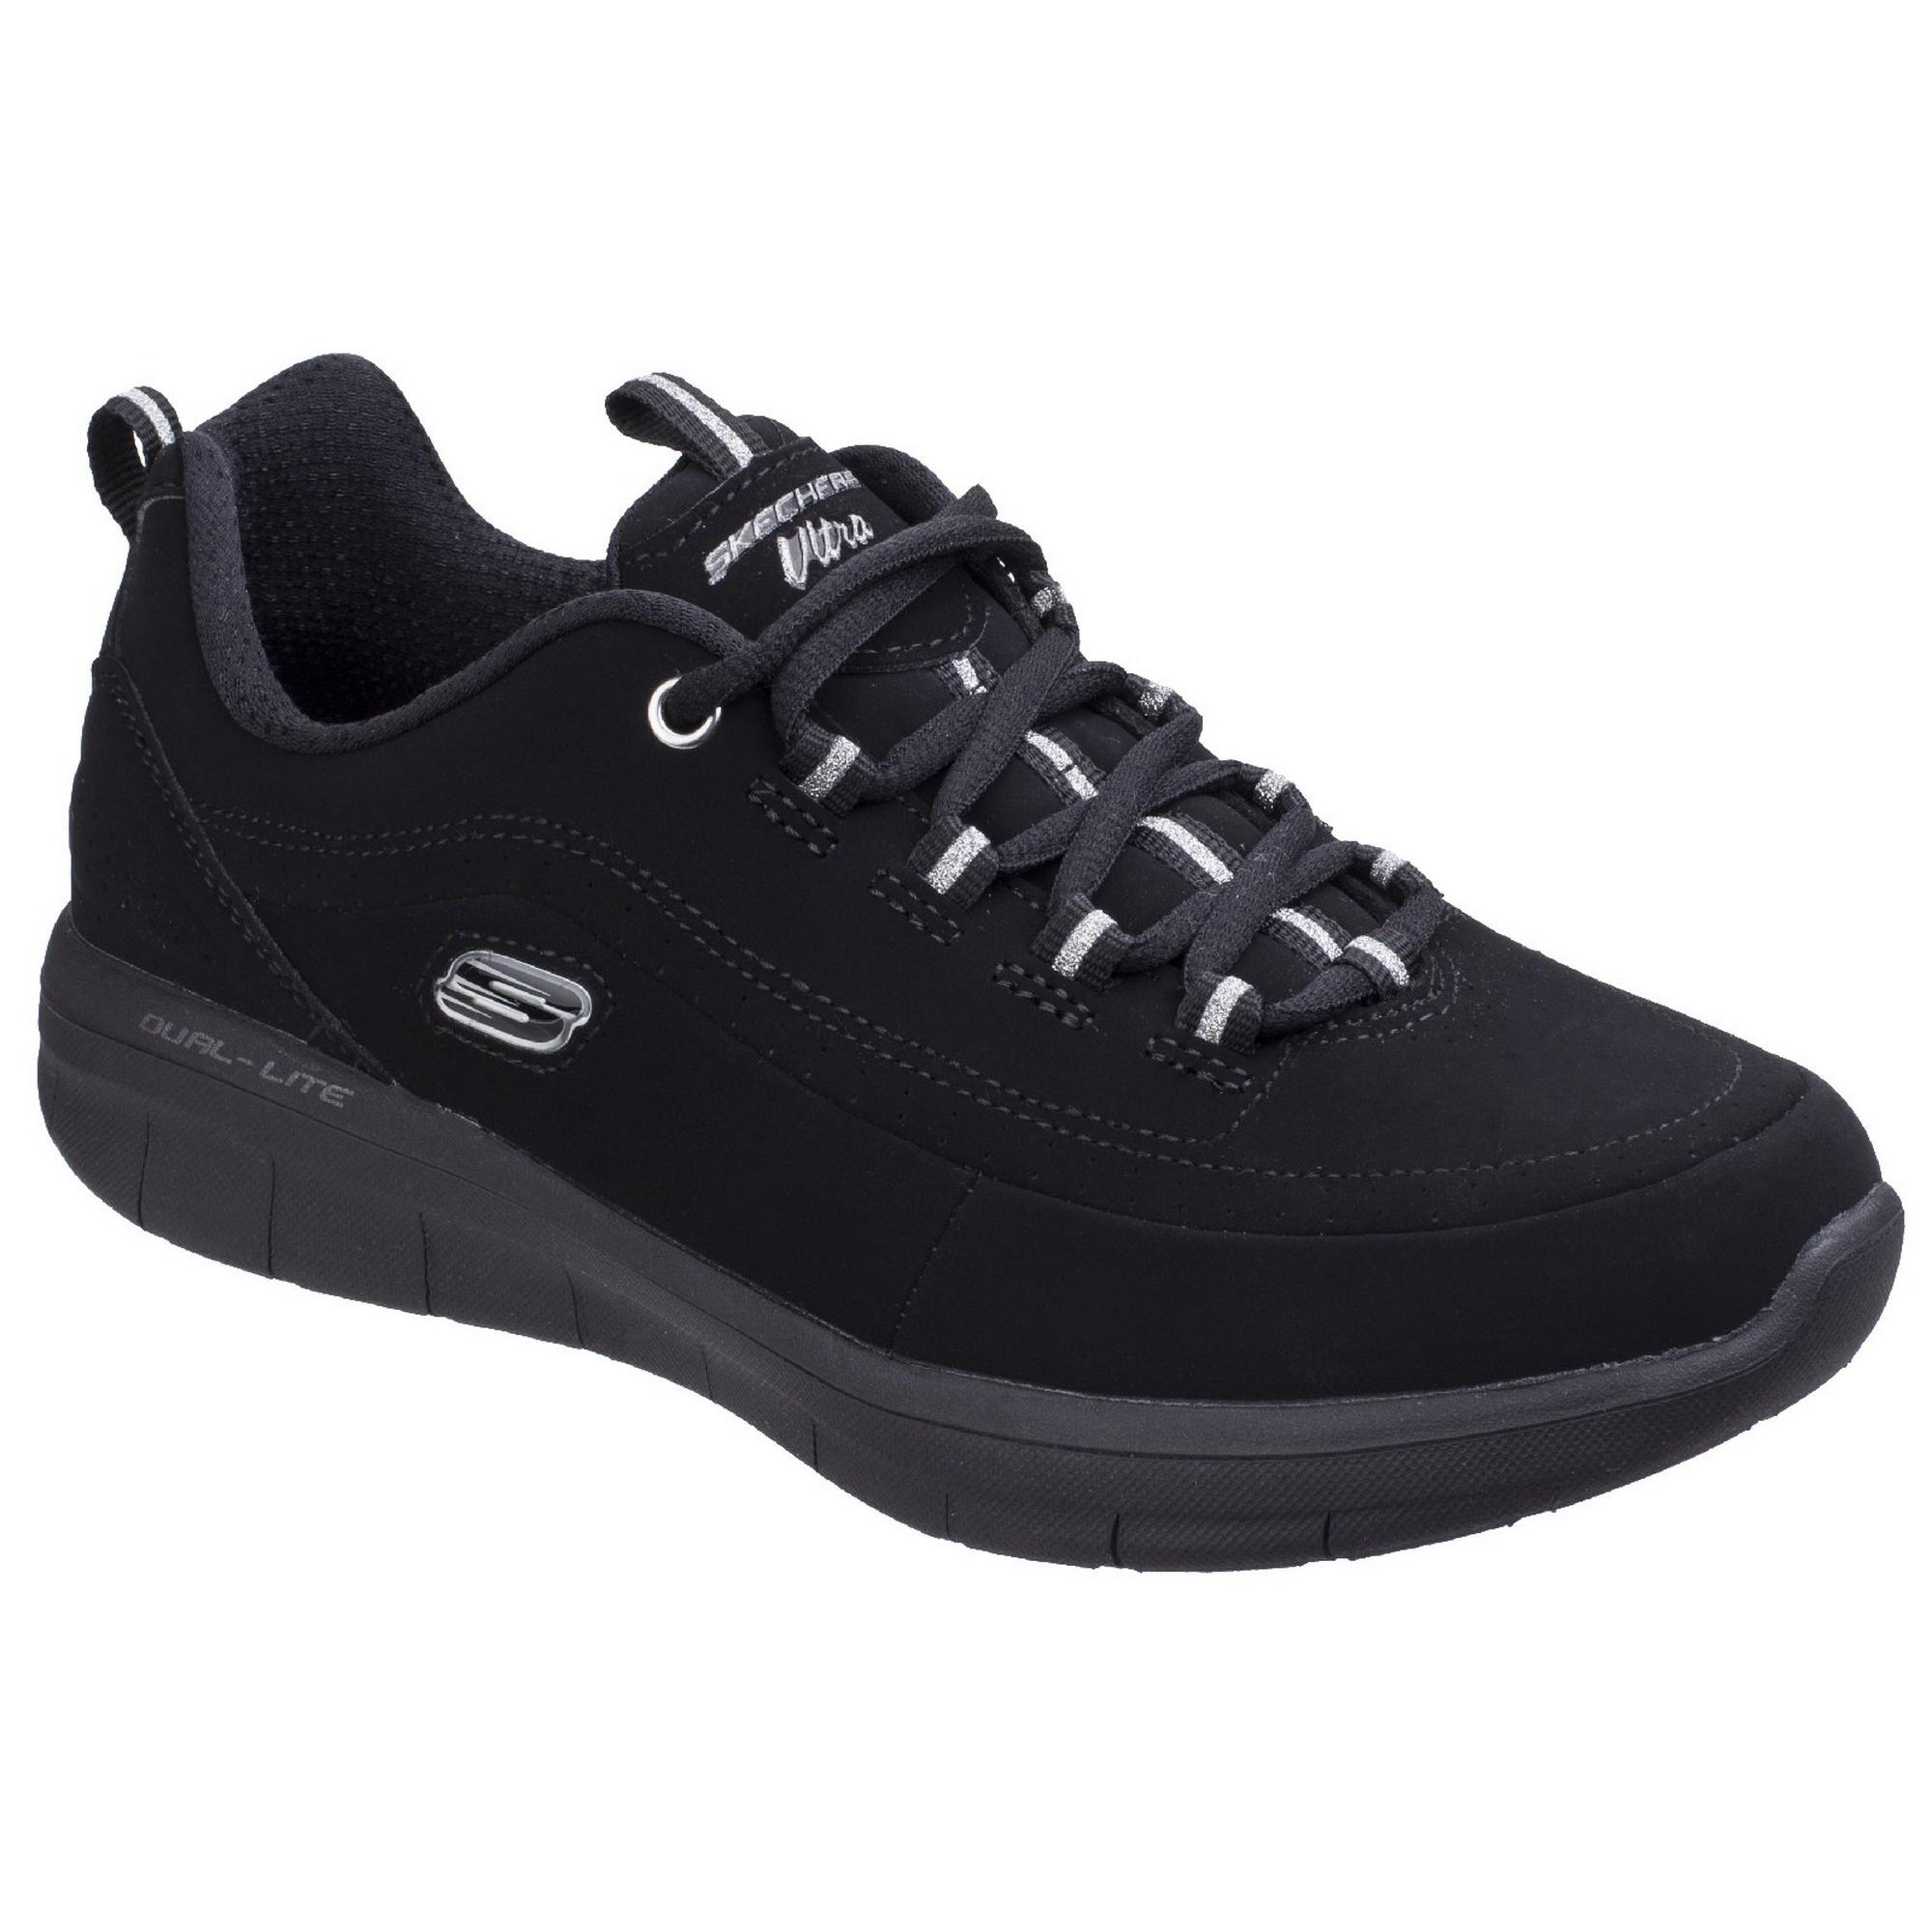 2180491e5f ... Skechers - Zapatillas deportivas modelo Synergy 2.0 para mujer (FS4431)  ...